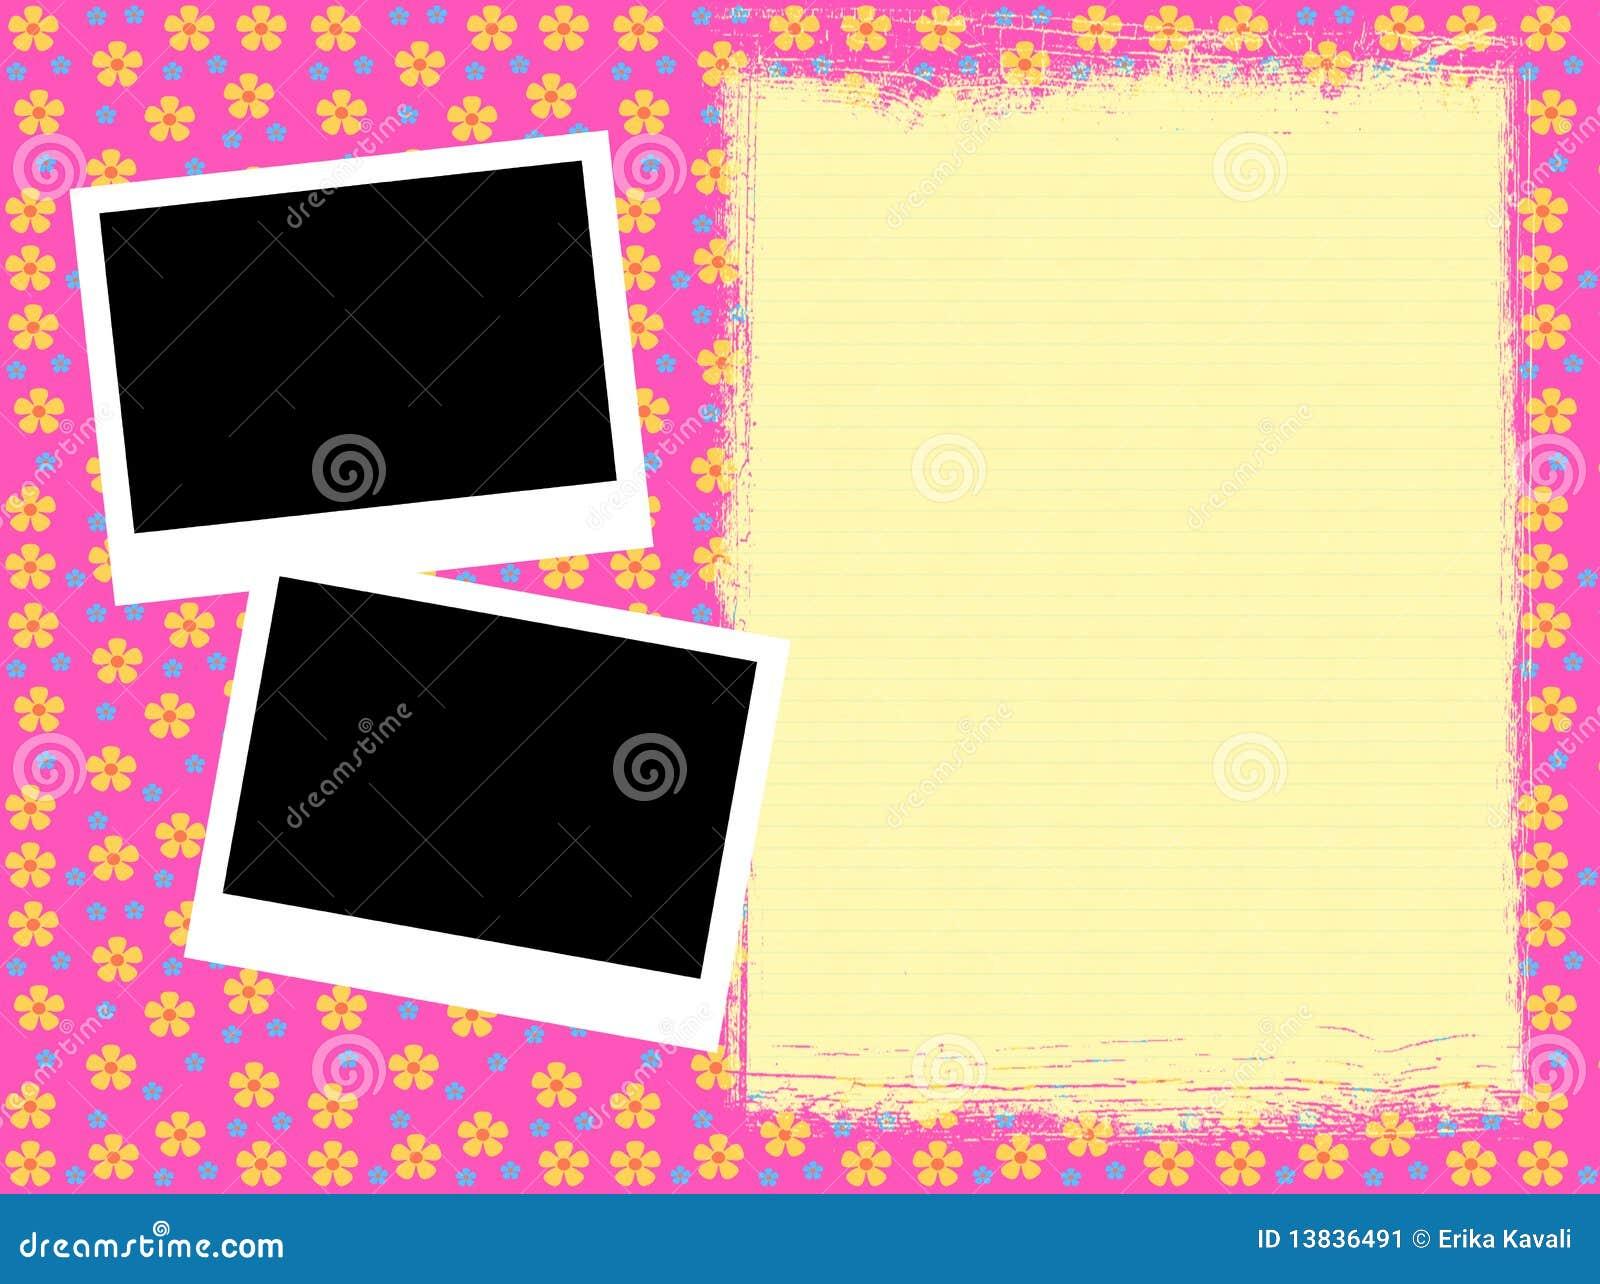 Girly Rahmen stock abbildung. Illustration von papier - 13836491